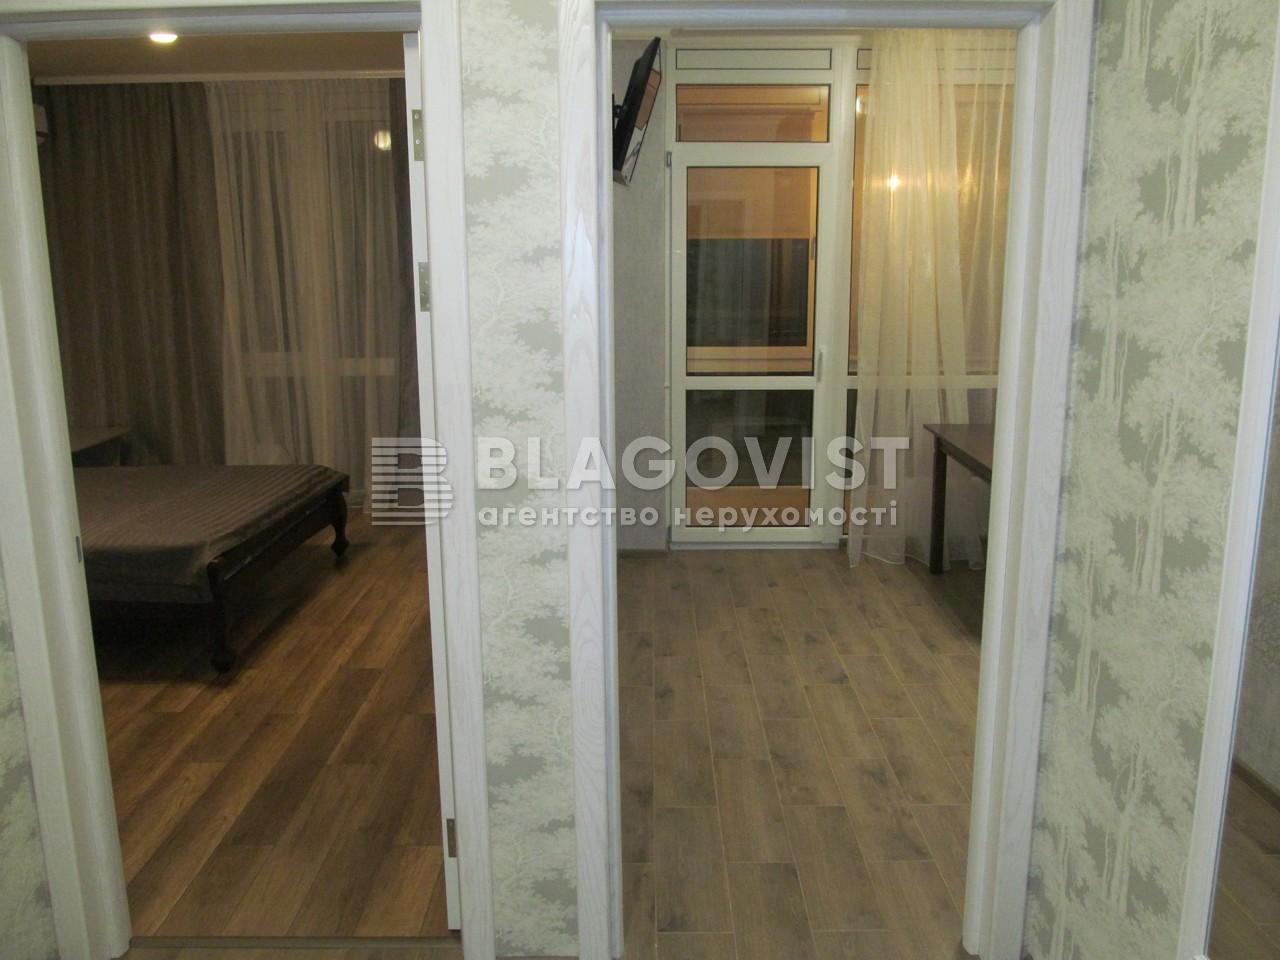 Квартира F-41048, Златоустовская, 34, Киев - Фото 11